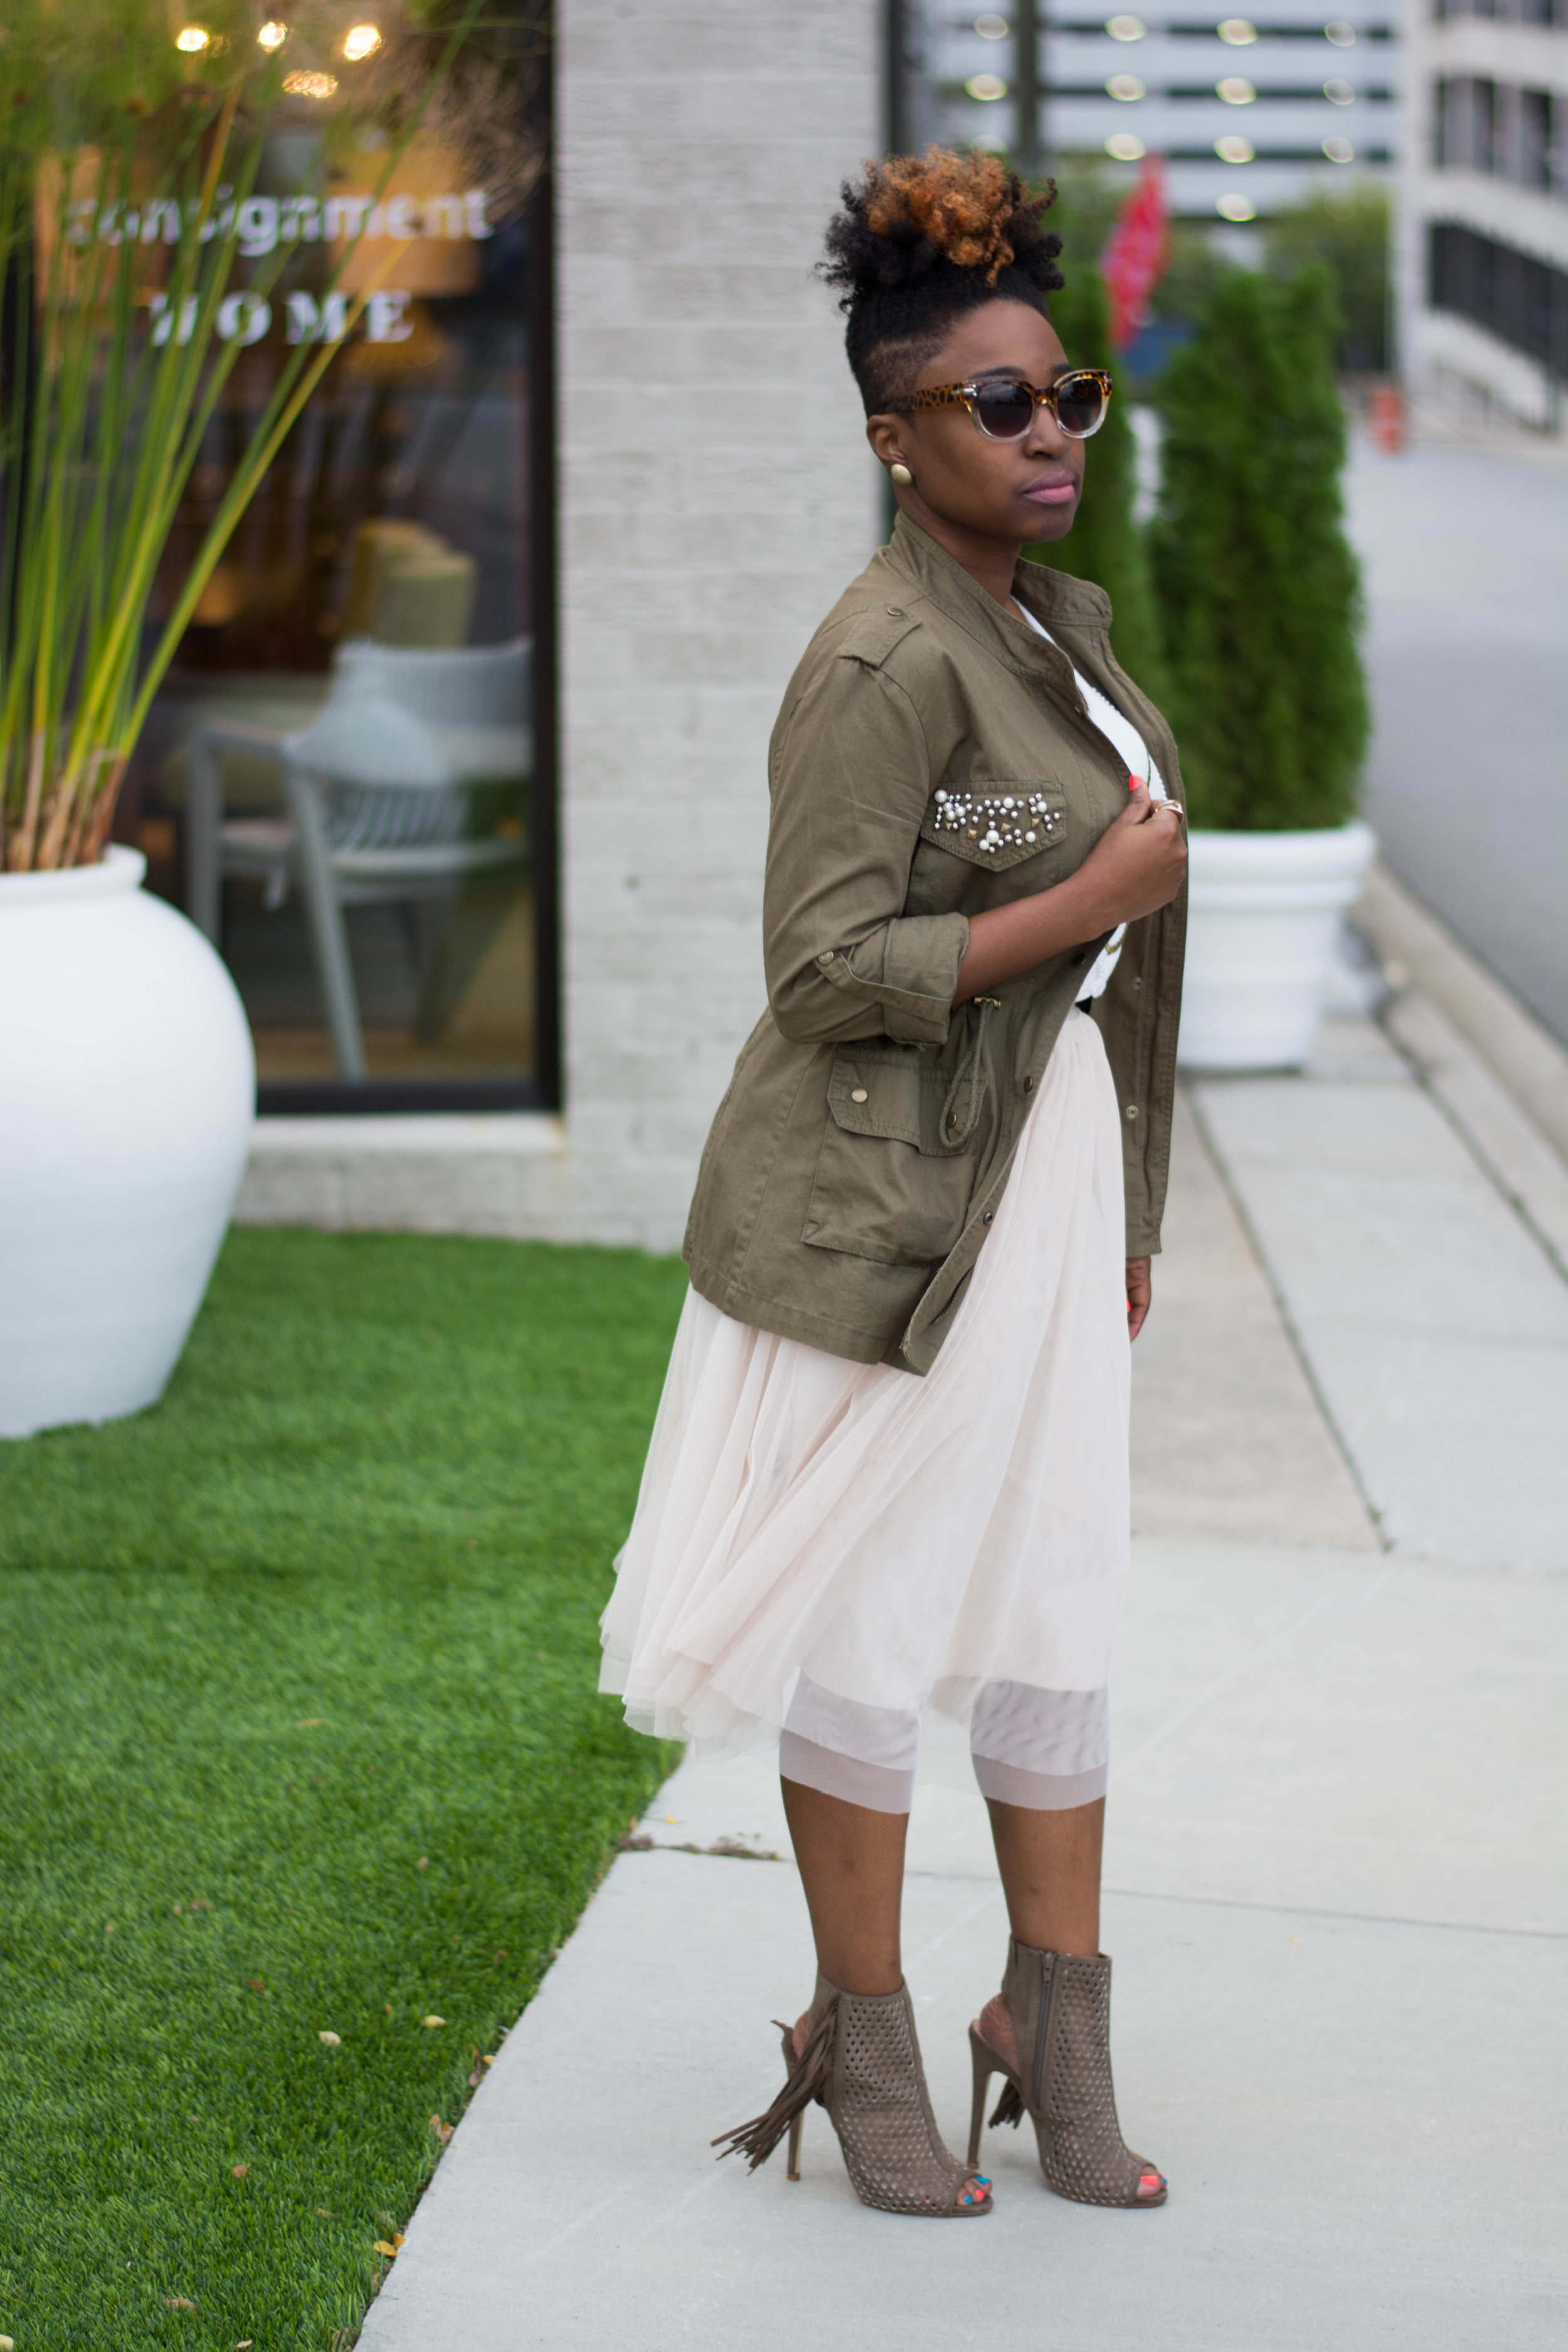 The Style Klazit, Melodie Stewart, Atlanta Style blogger, Atlanta Stylist, Tulle skirt, Fall fashion, Cargo jacket